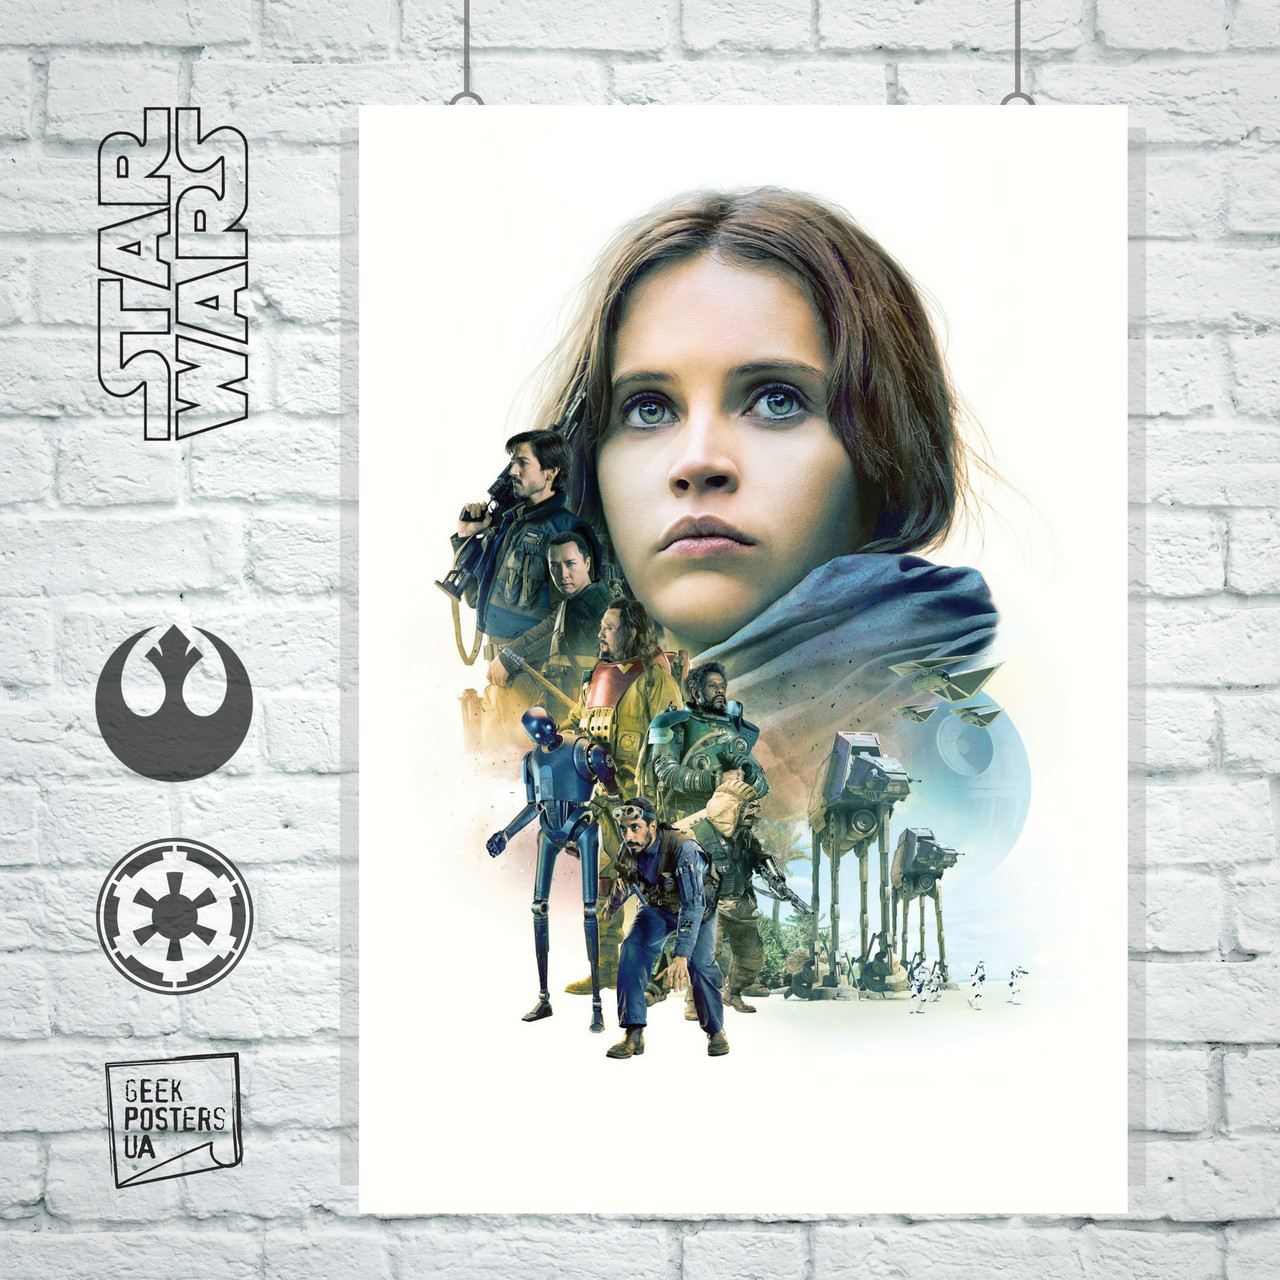 Постер Звёздные Войны: Изгой Один, Star Wars: Rogue One, белый фон. Размер 60x42см (A2). Глянцевая бумага